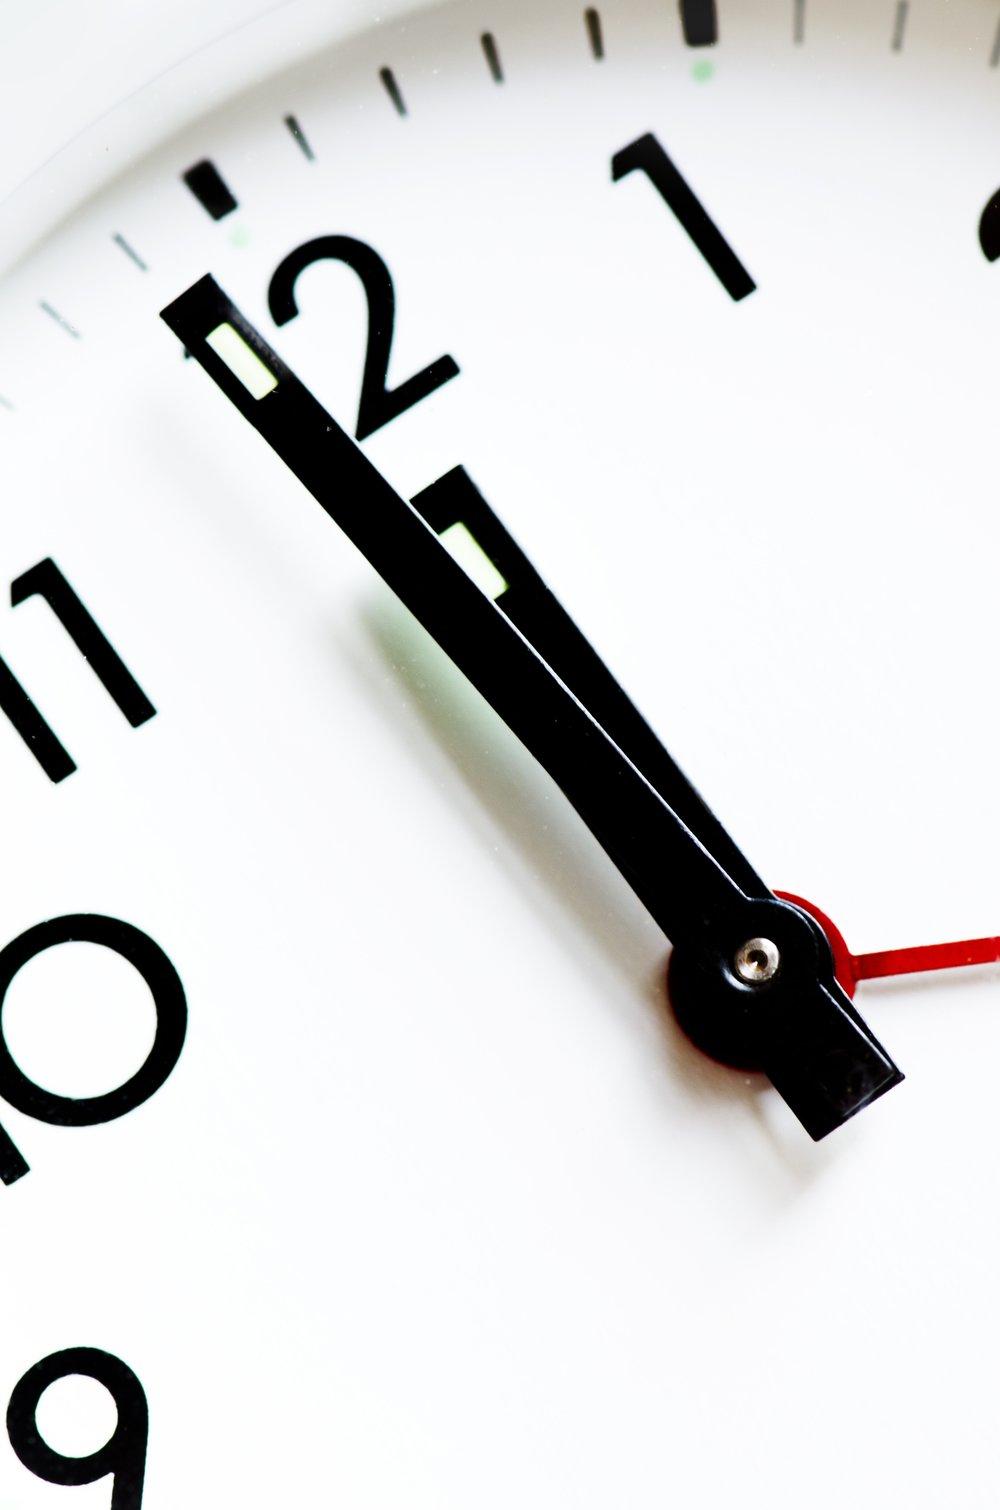 accuracy-afternoon-alarm-clock-280277.jpg